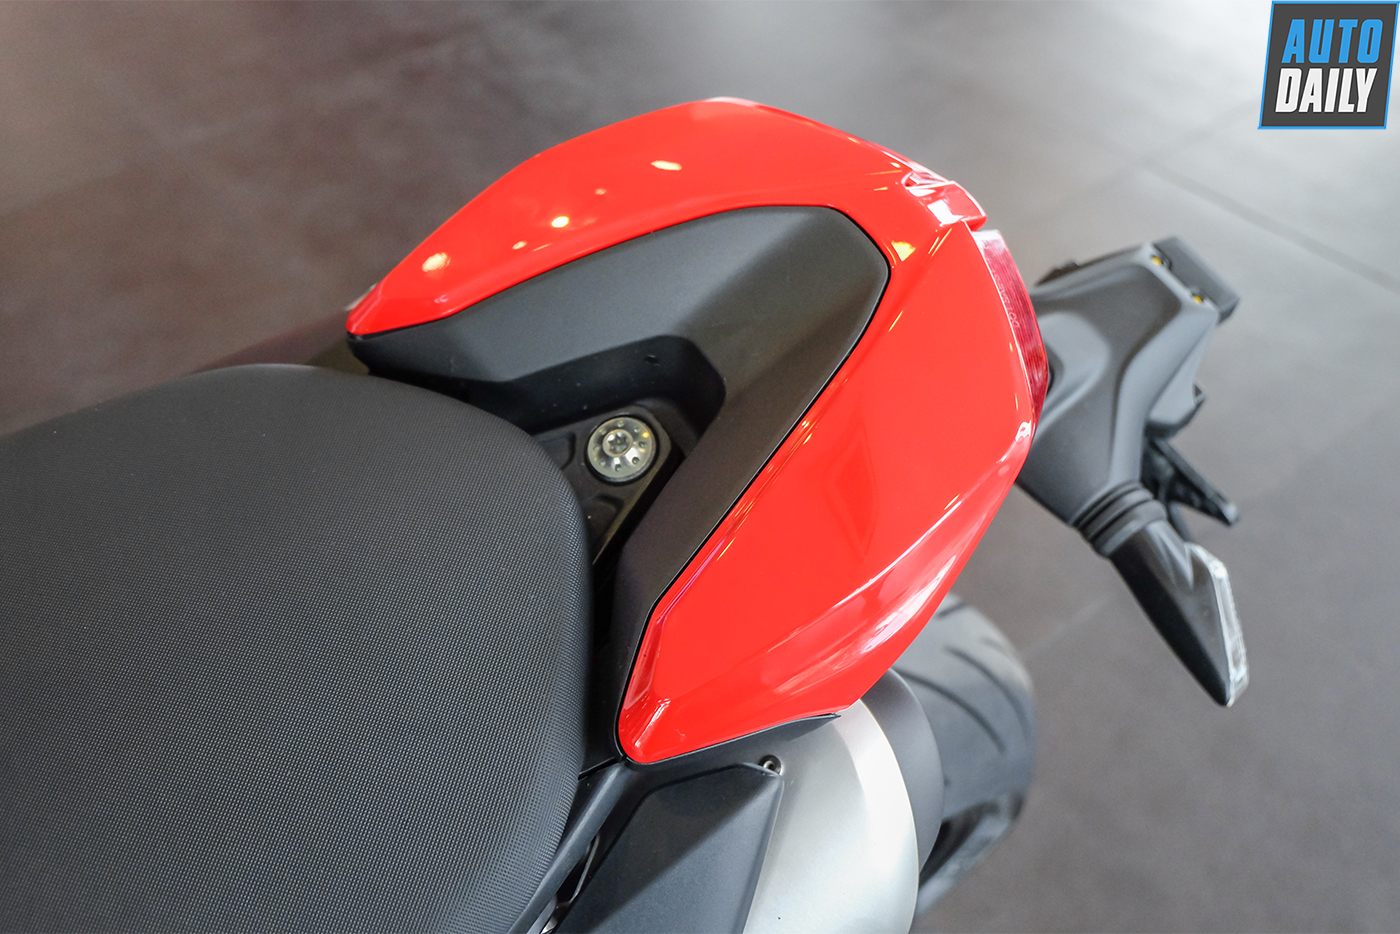 ducati-hypermotard-950-2019-88.jpg